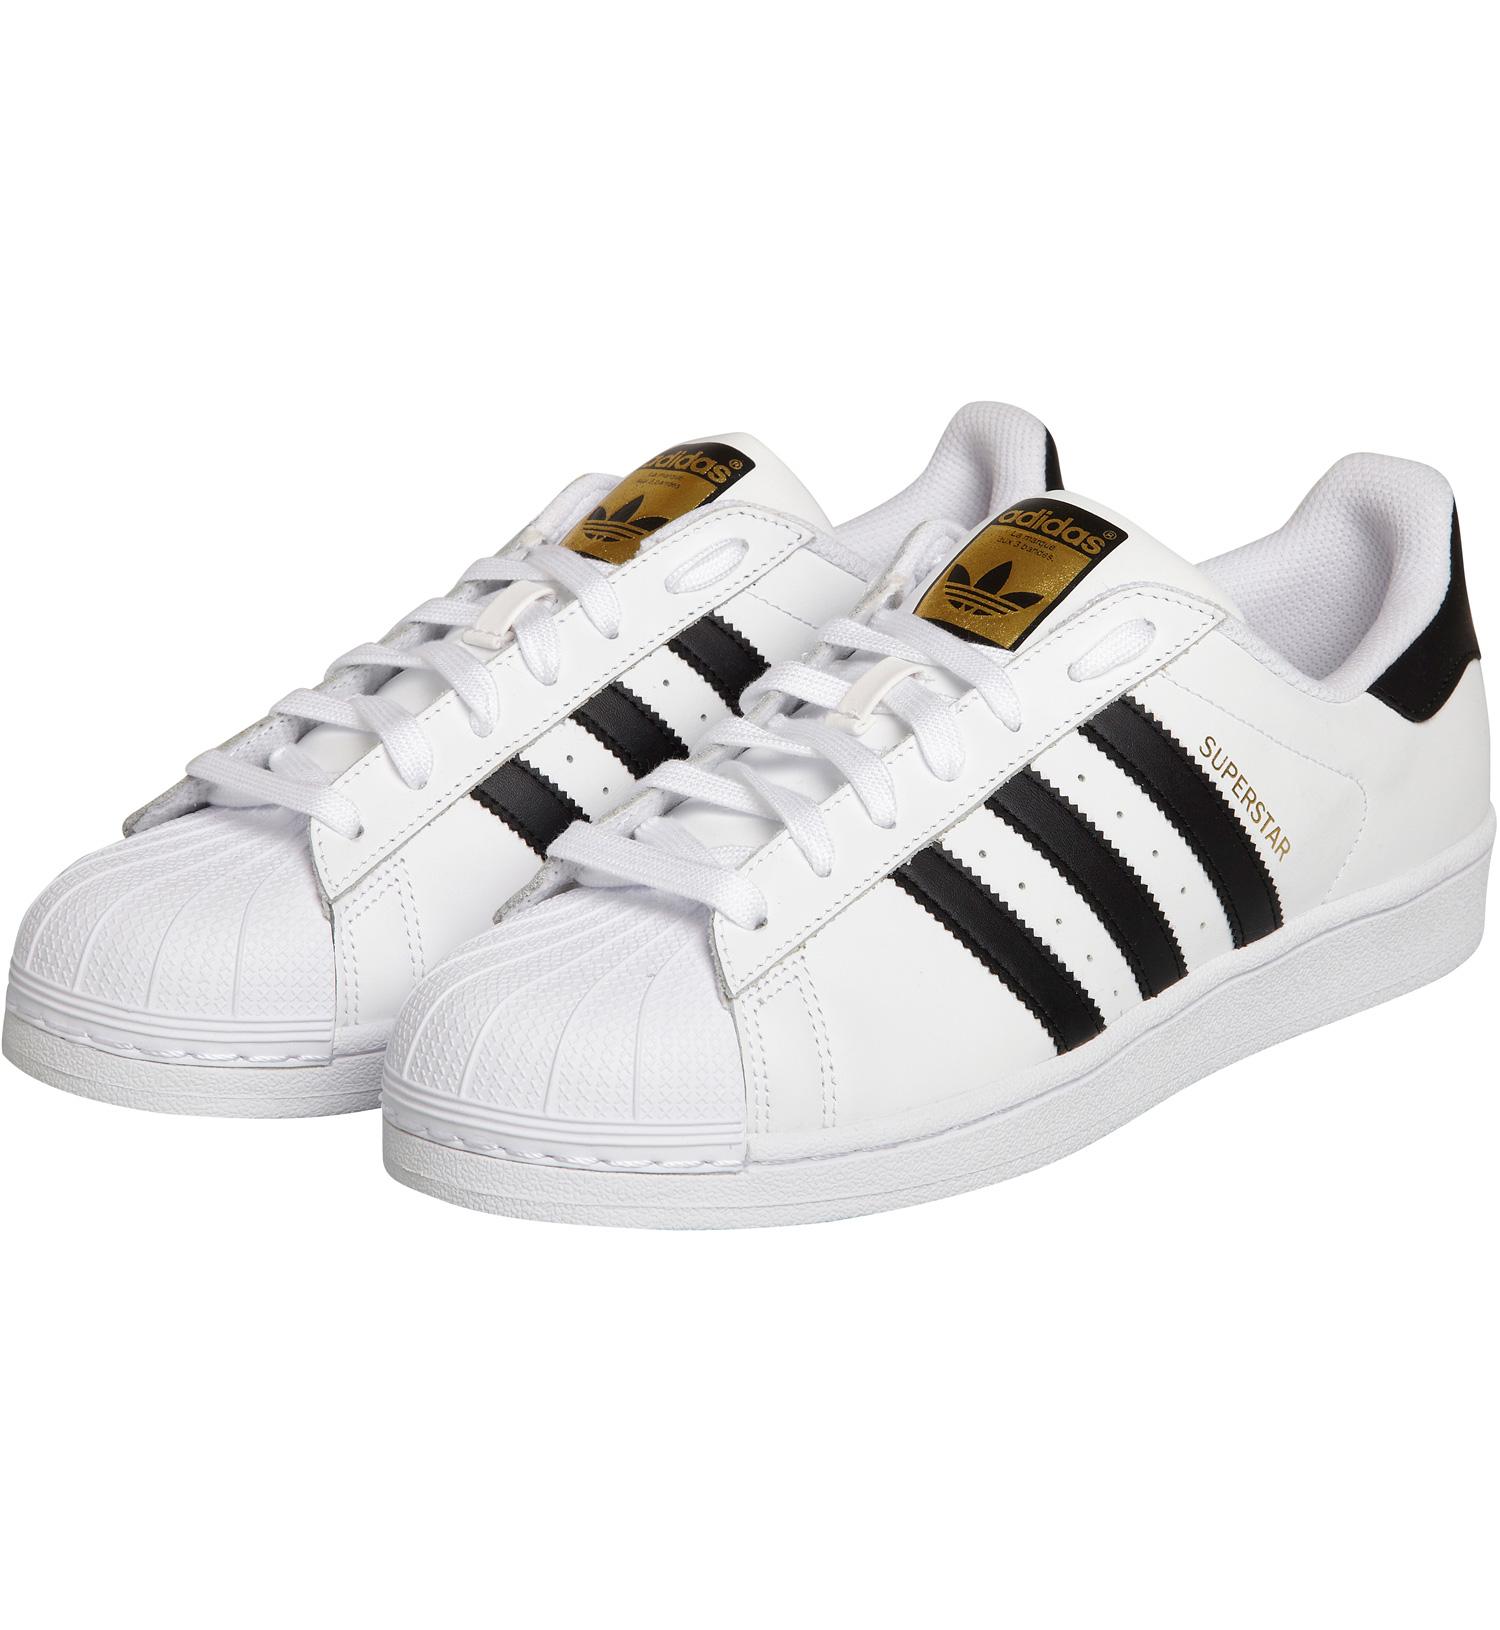 adidas superstar noir et blanc femme